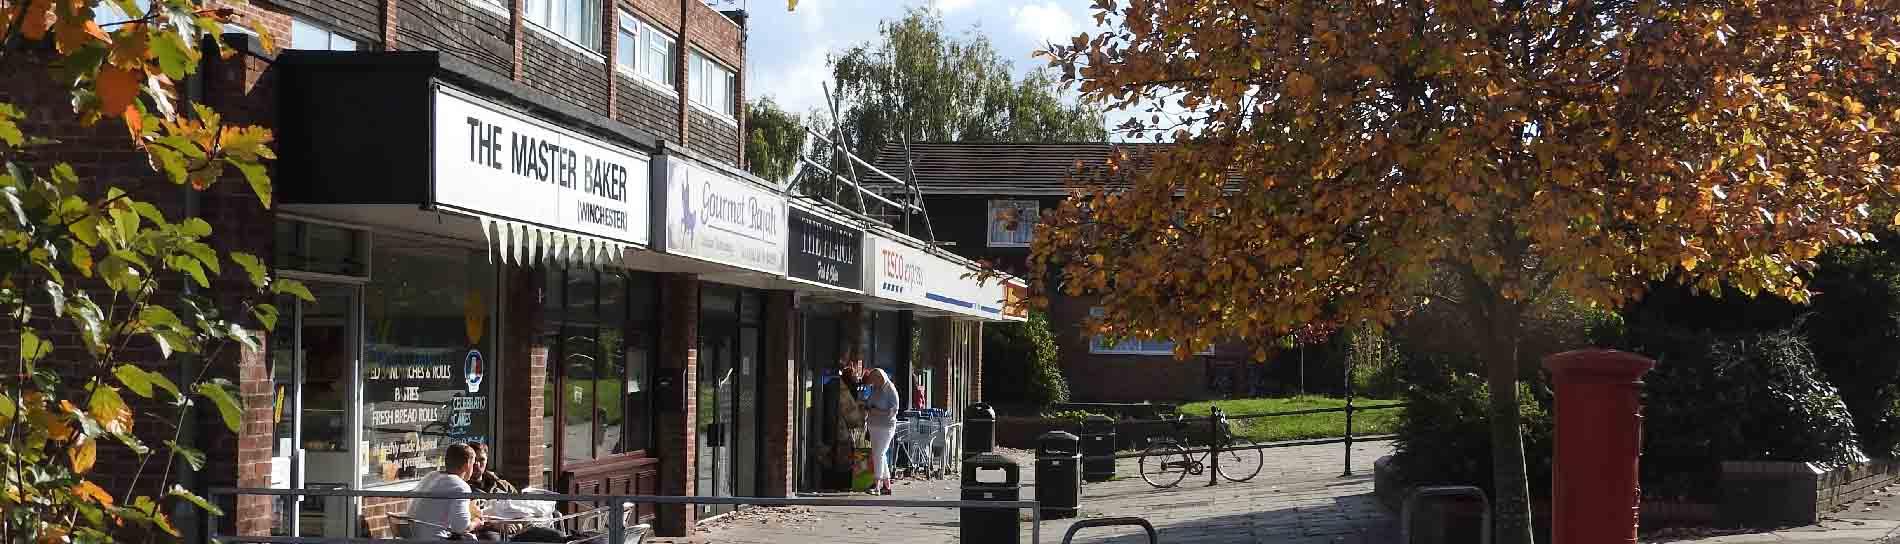 Harestock Shops